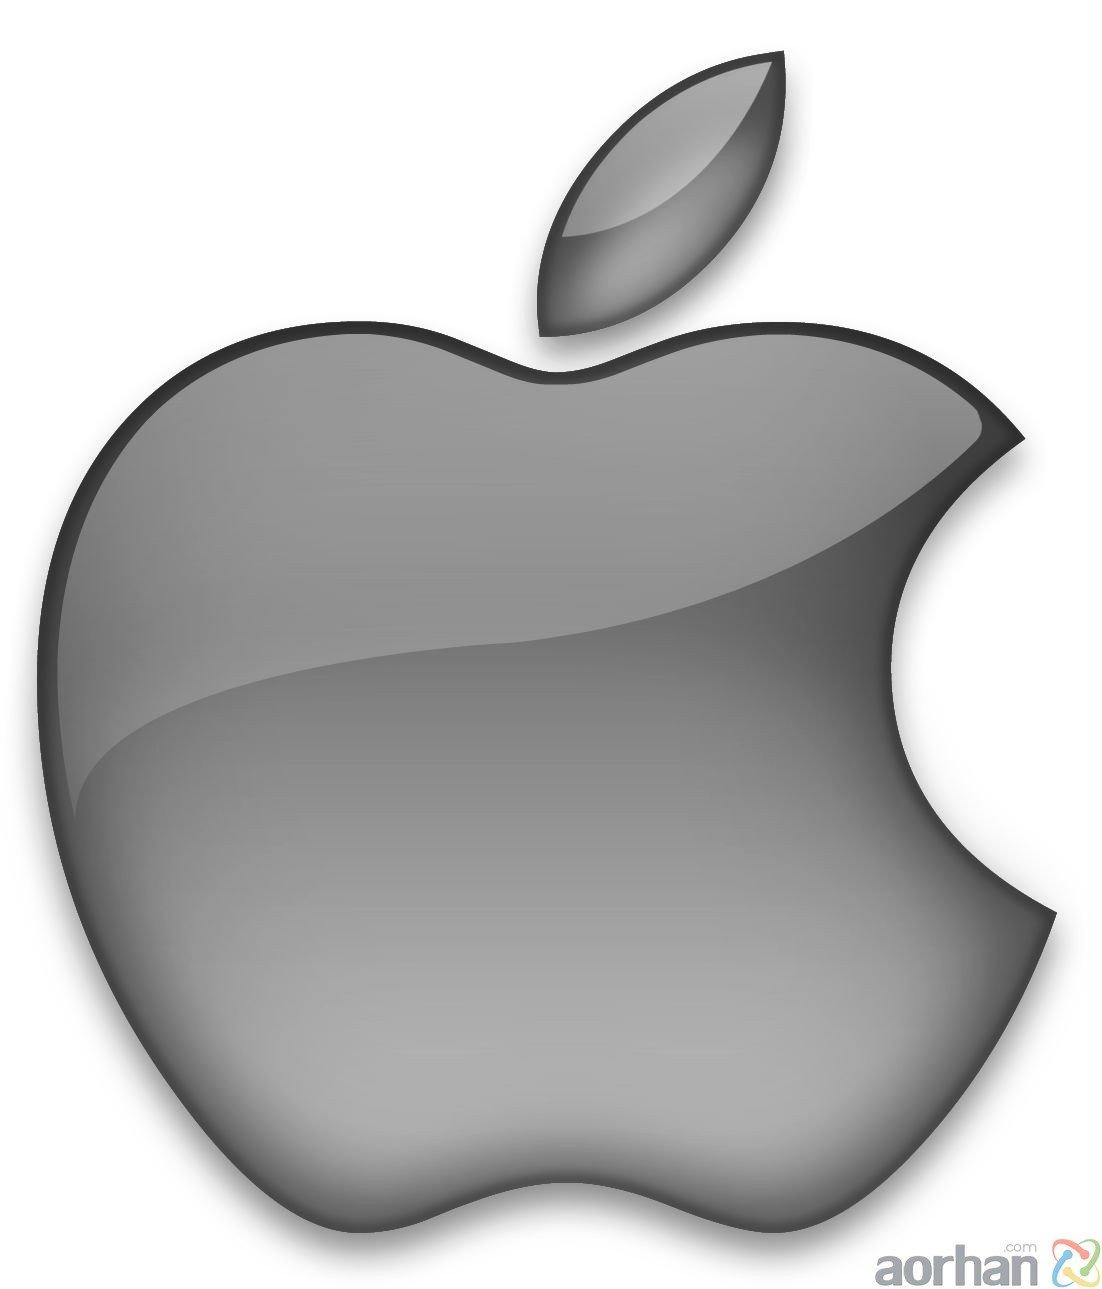 silver-apple-logo-apple-picture